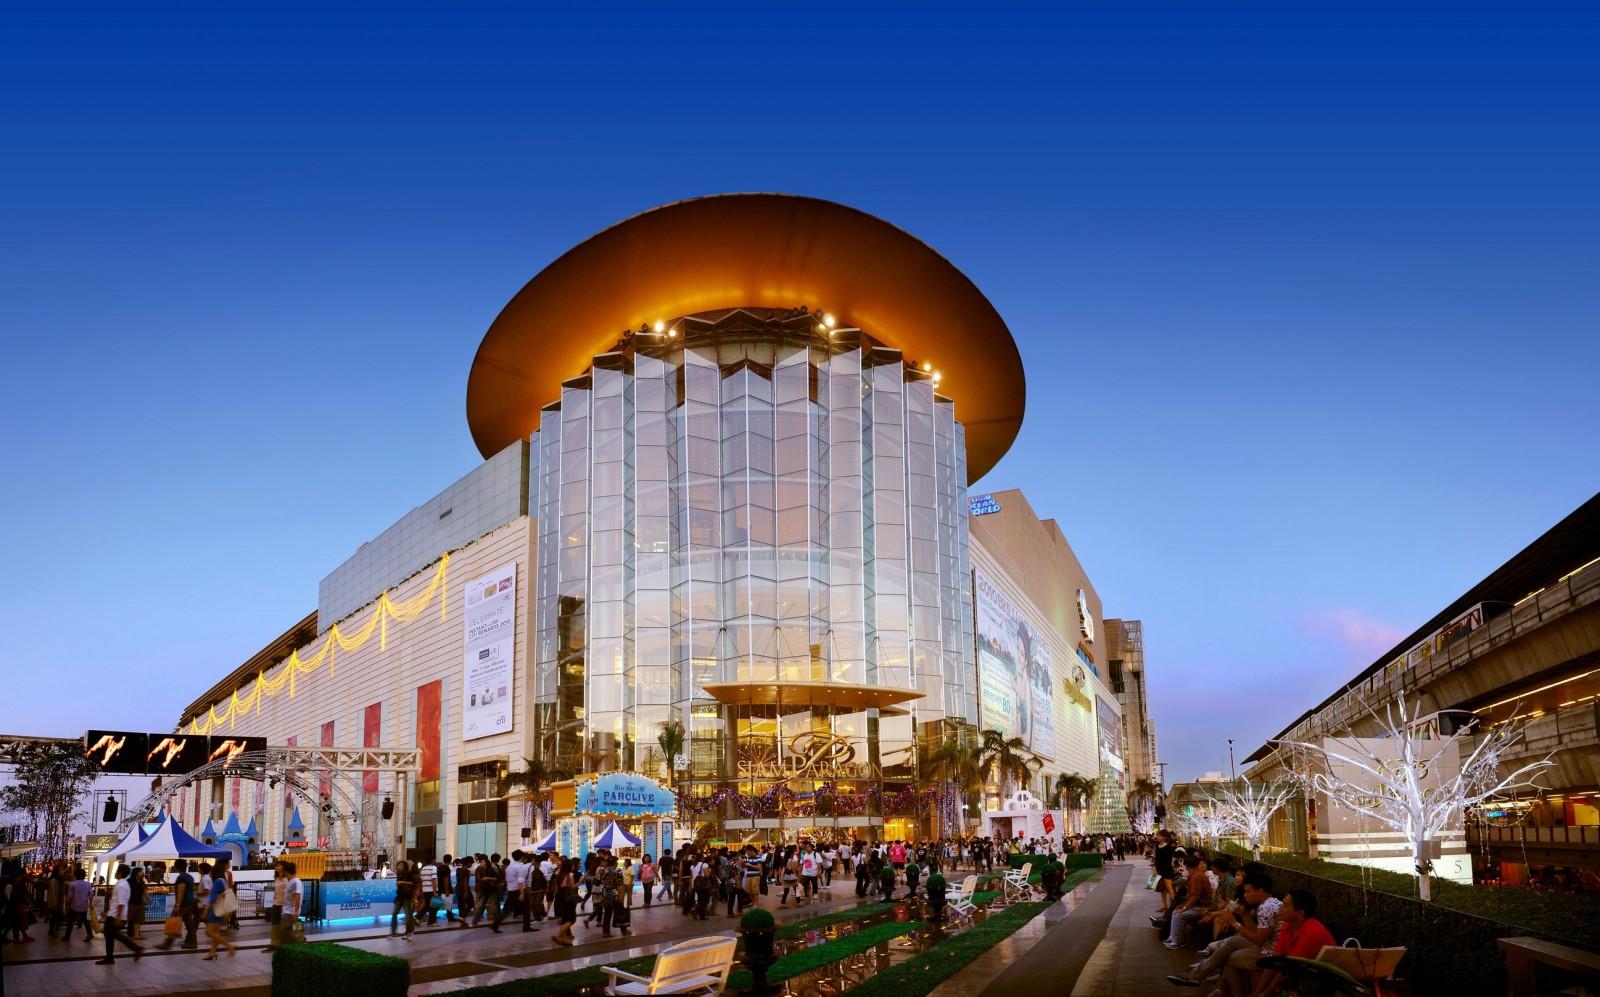 siam-paragon-shopping-mall-in-bangkok-thailand